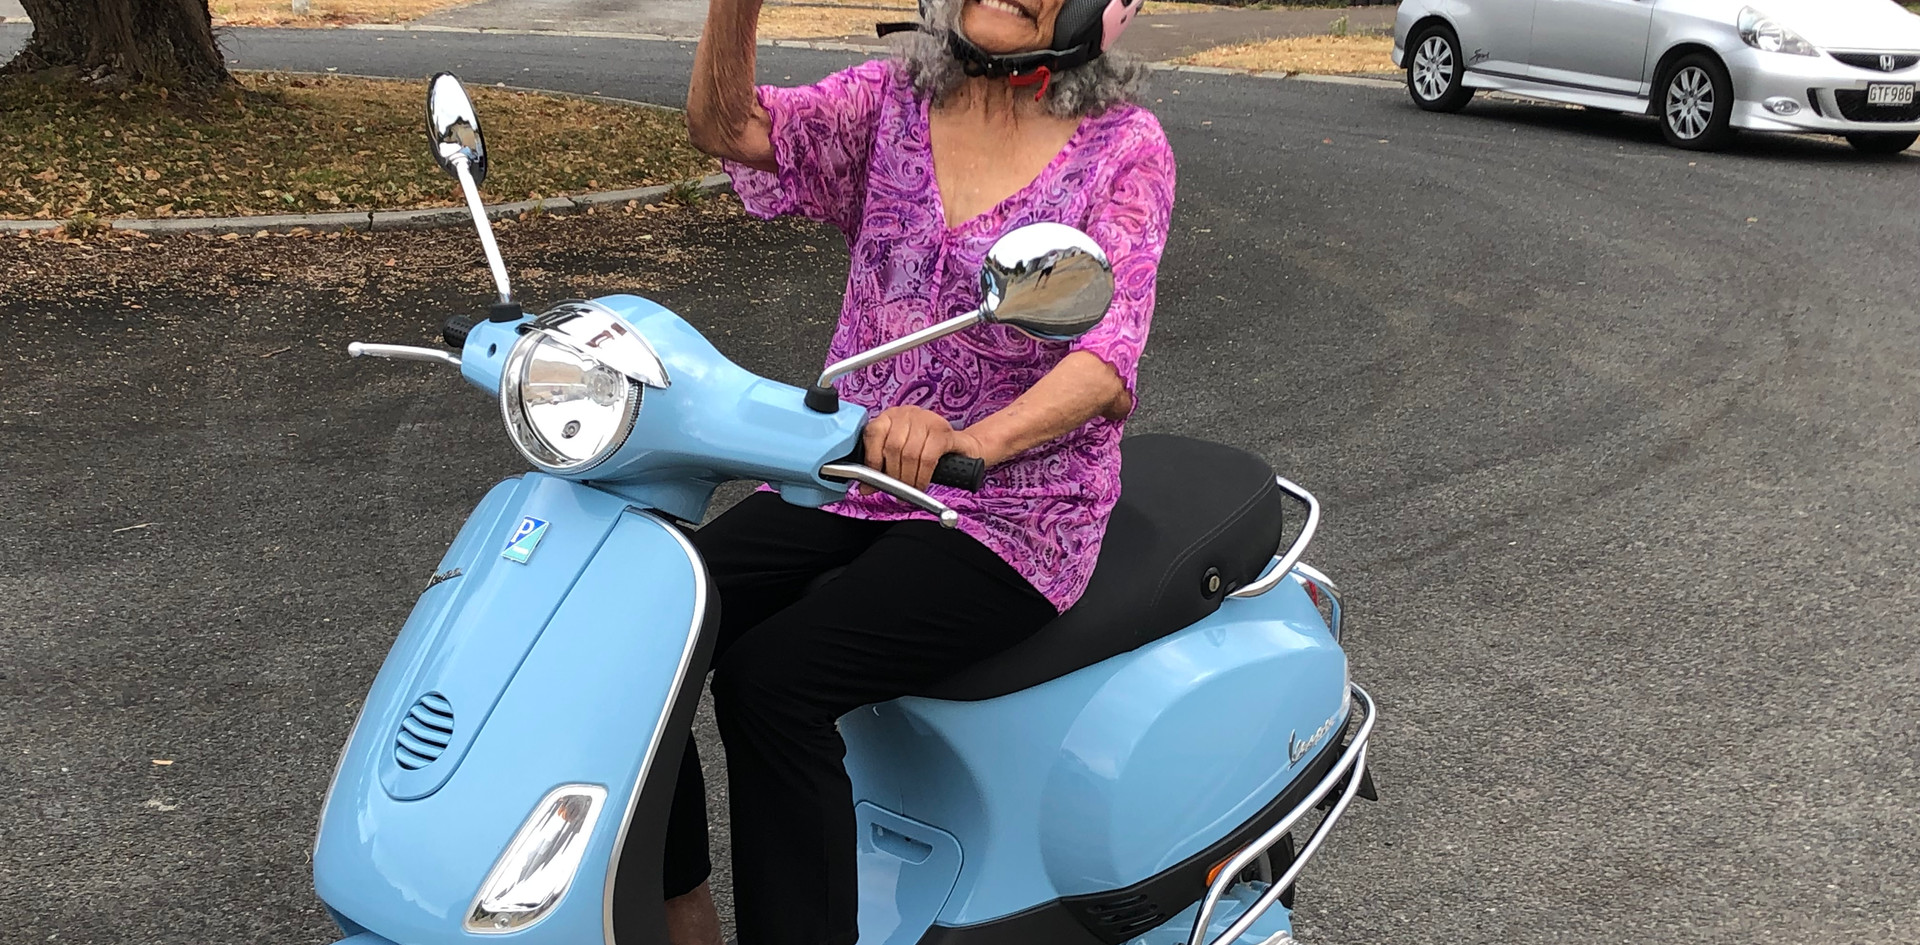 Rangi on Scooter.JPG